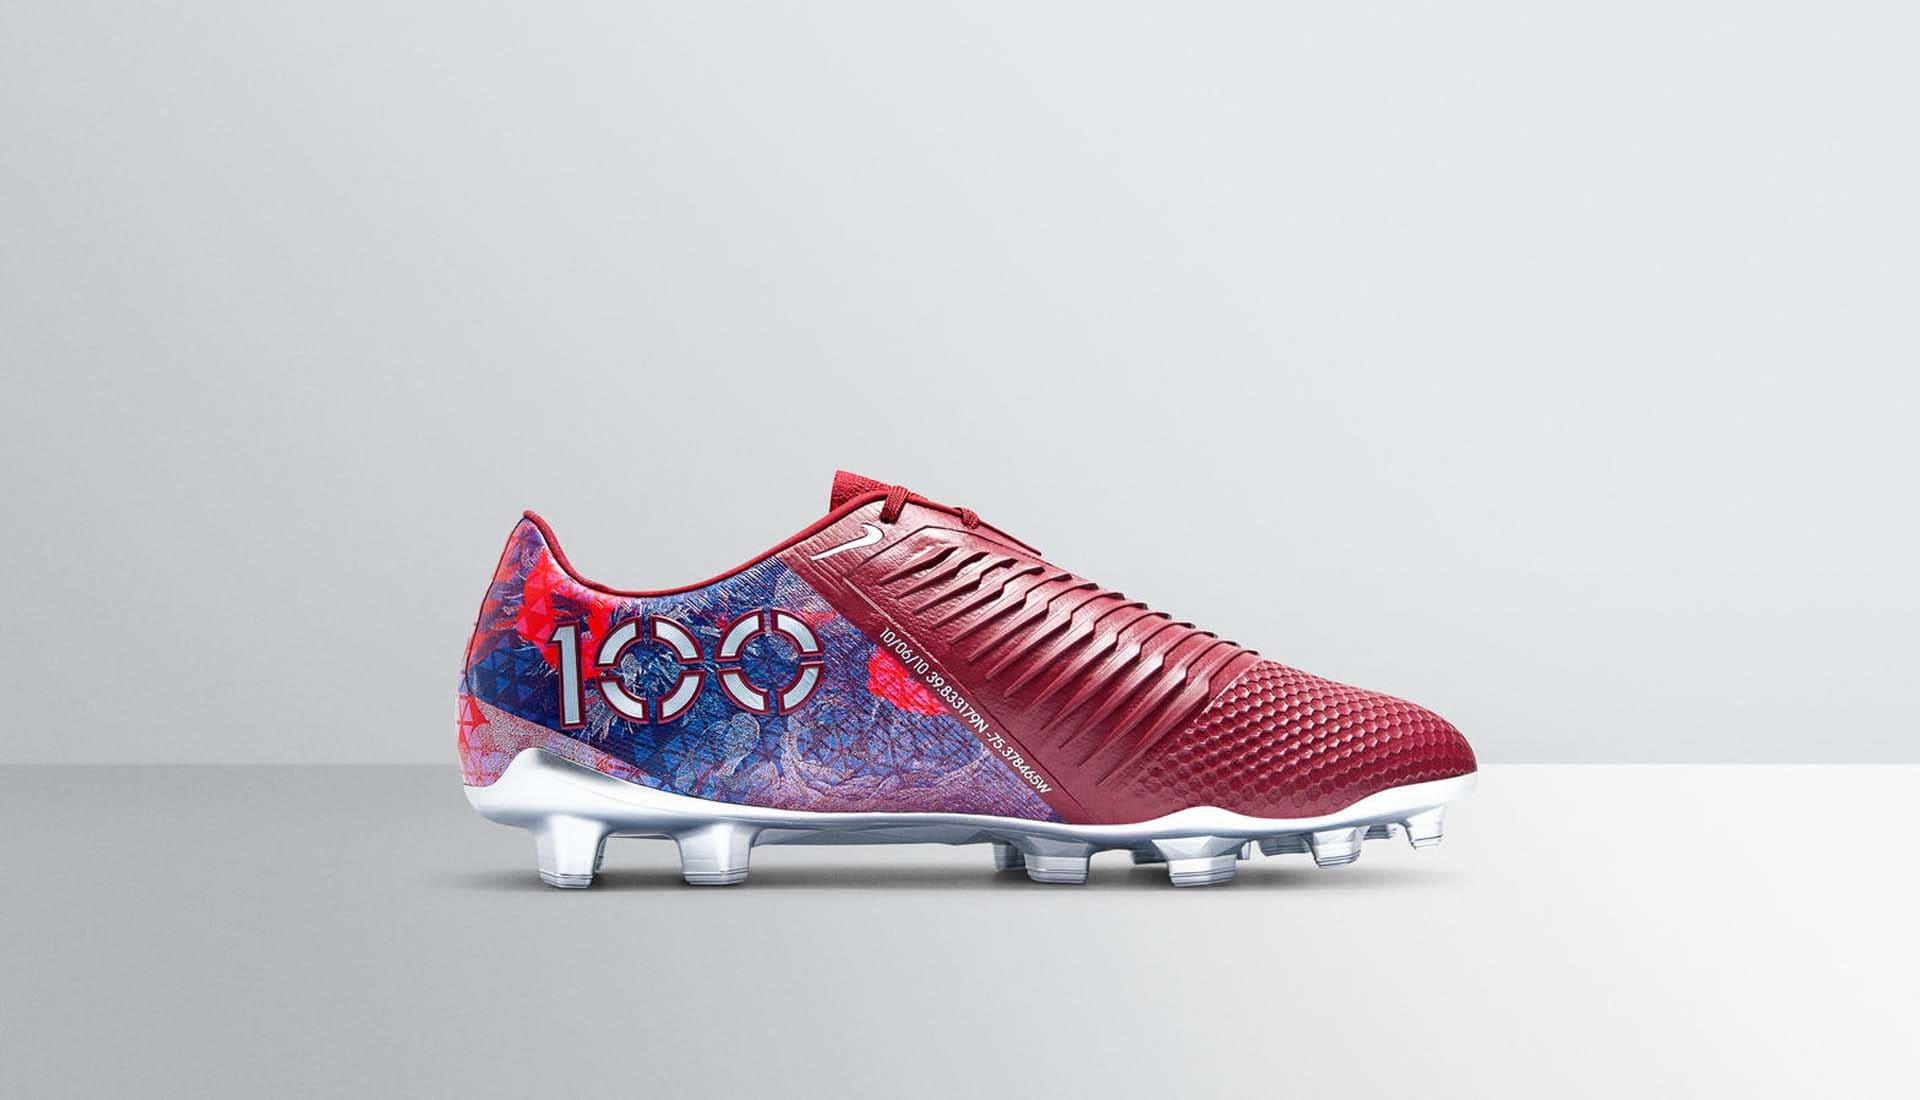 best loved b87e8 0f1d2 Nike Present Alex Morgan With Special-Edition PhantomVNM ...